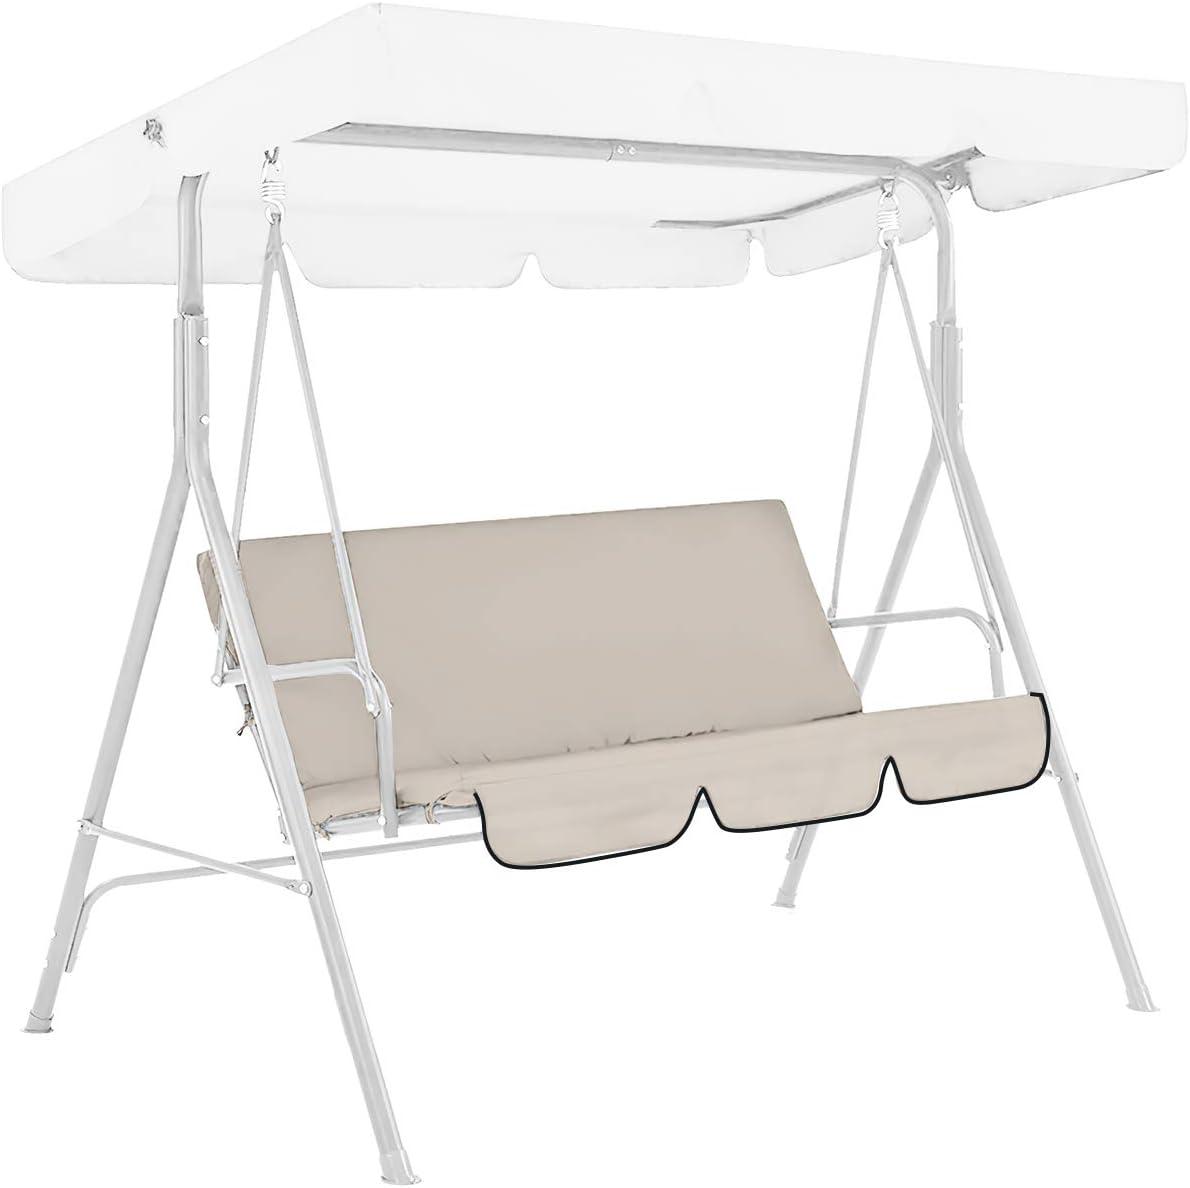 3 Seater Swing Seat Chair Hammock Cover Garden Furniture Protector WATERPROOF